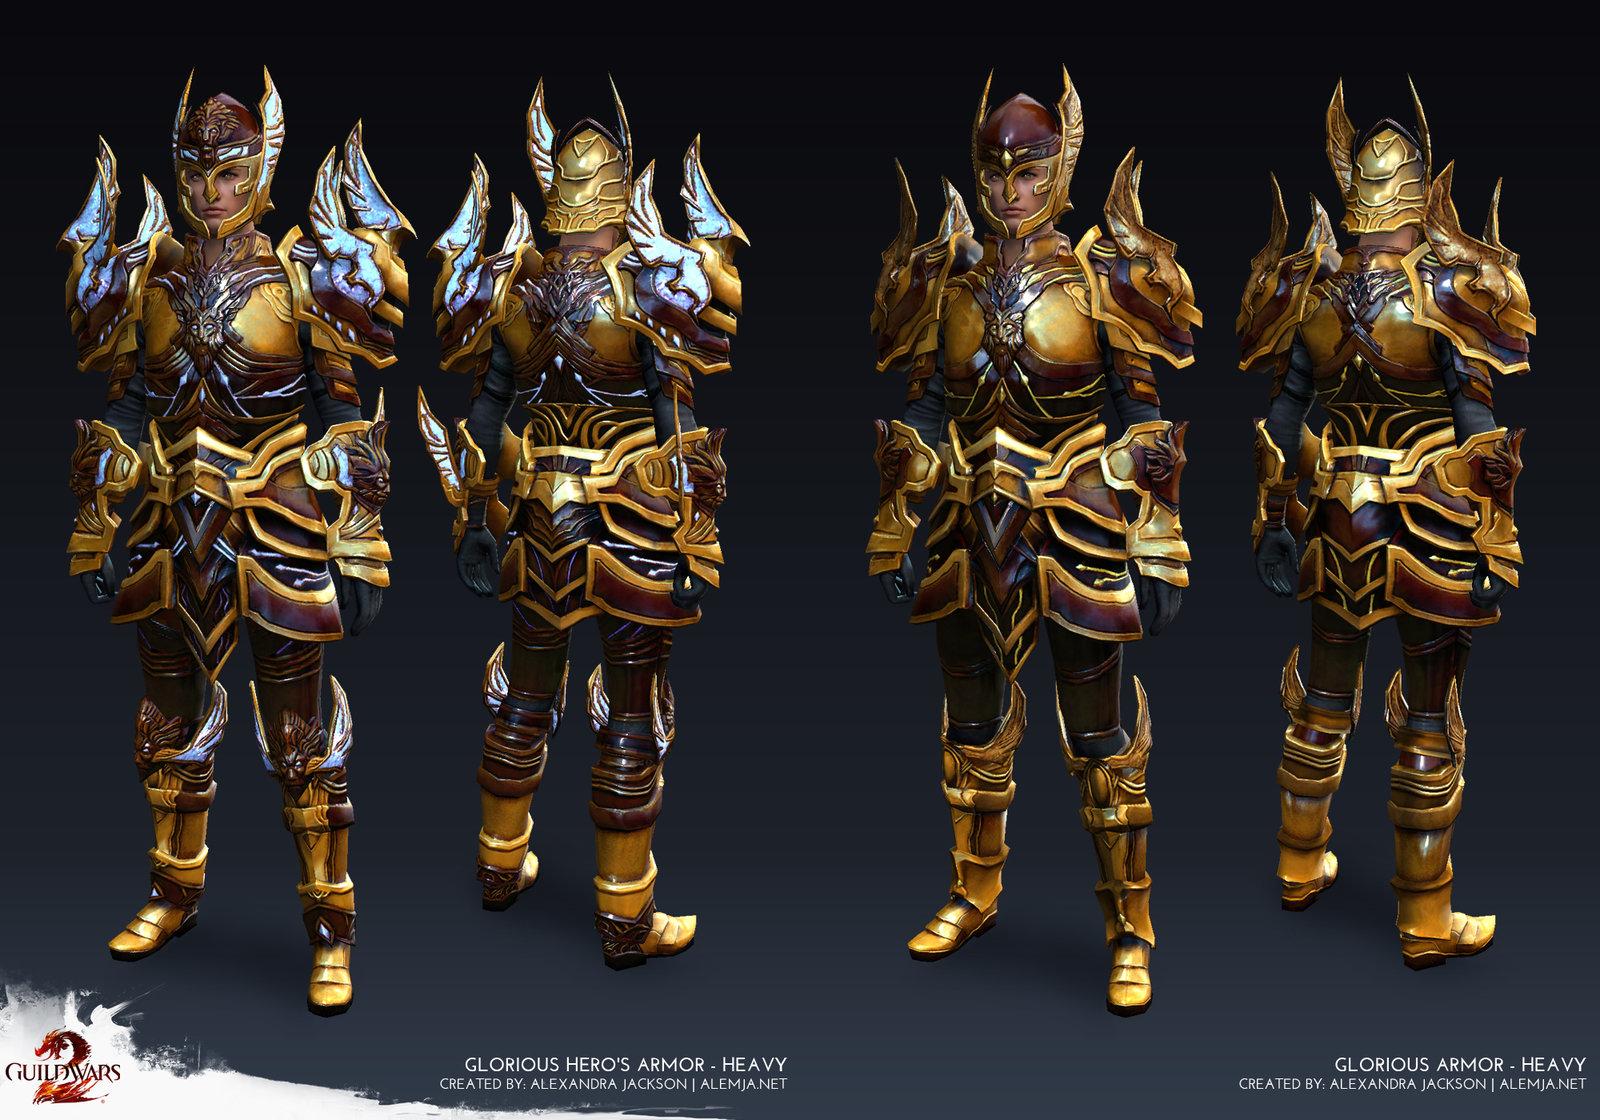 Guild Wars 2 - Heavy Male Glorious Armor